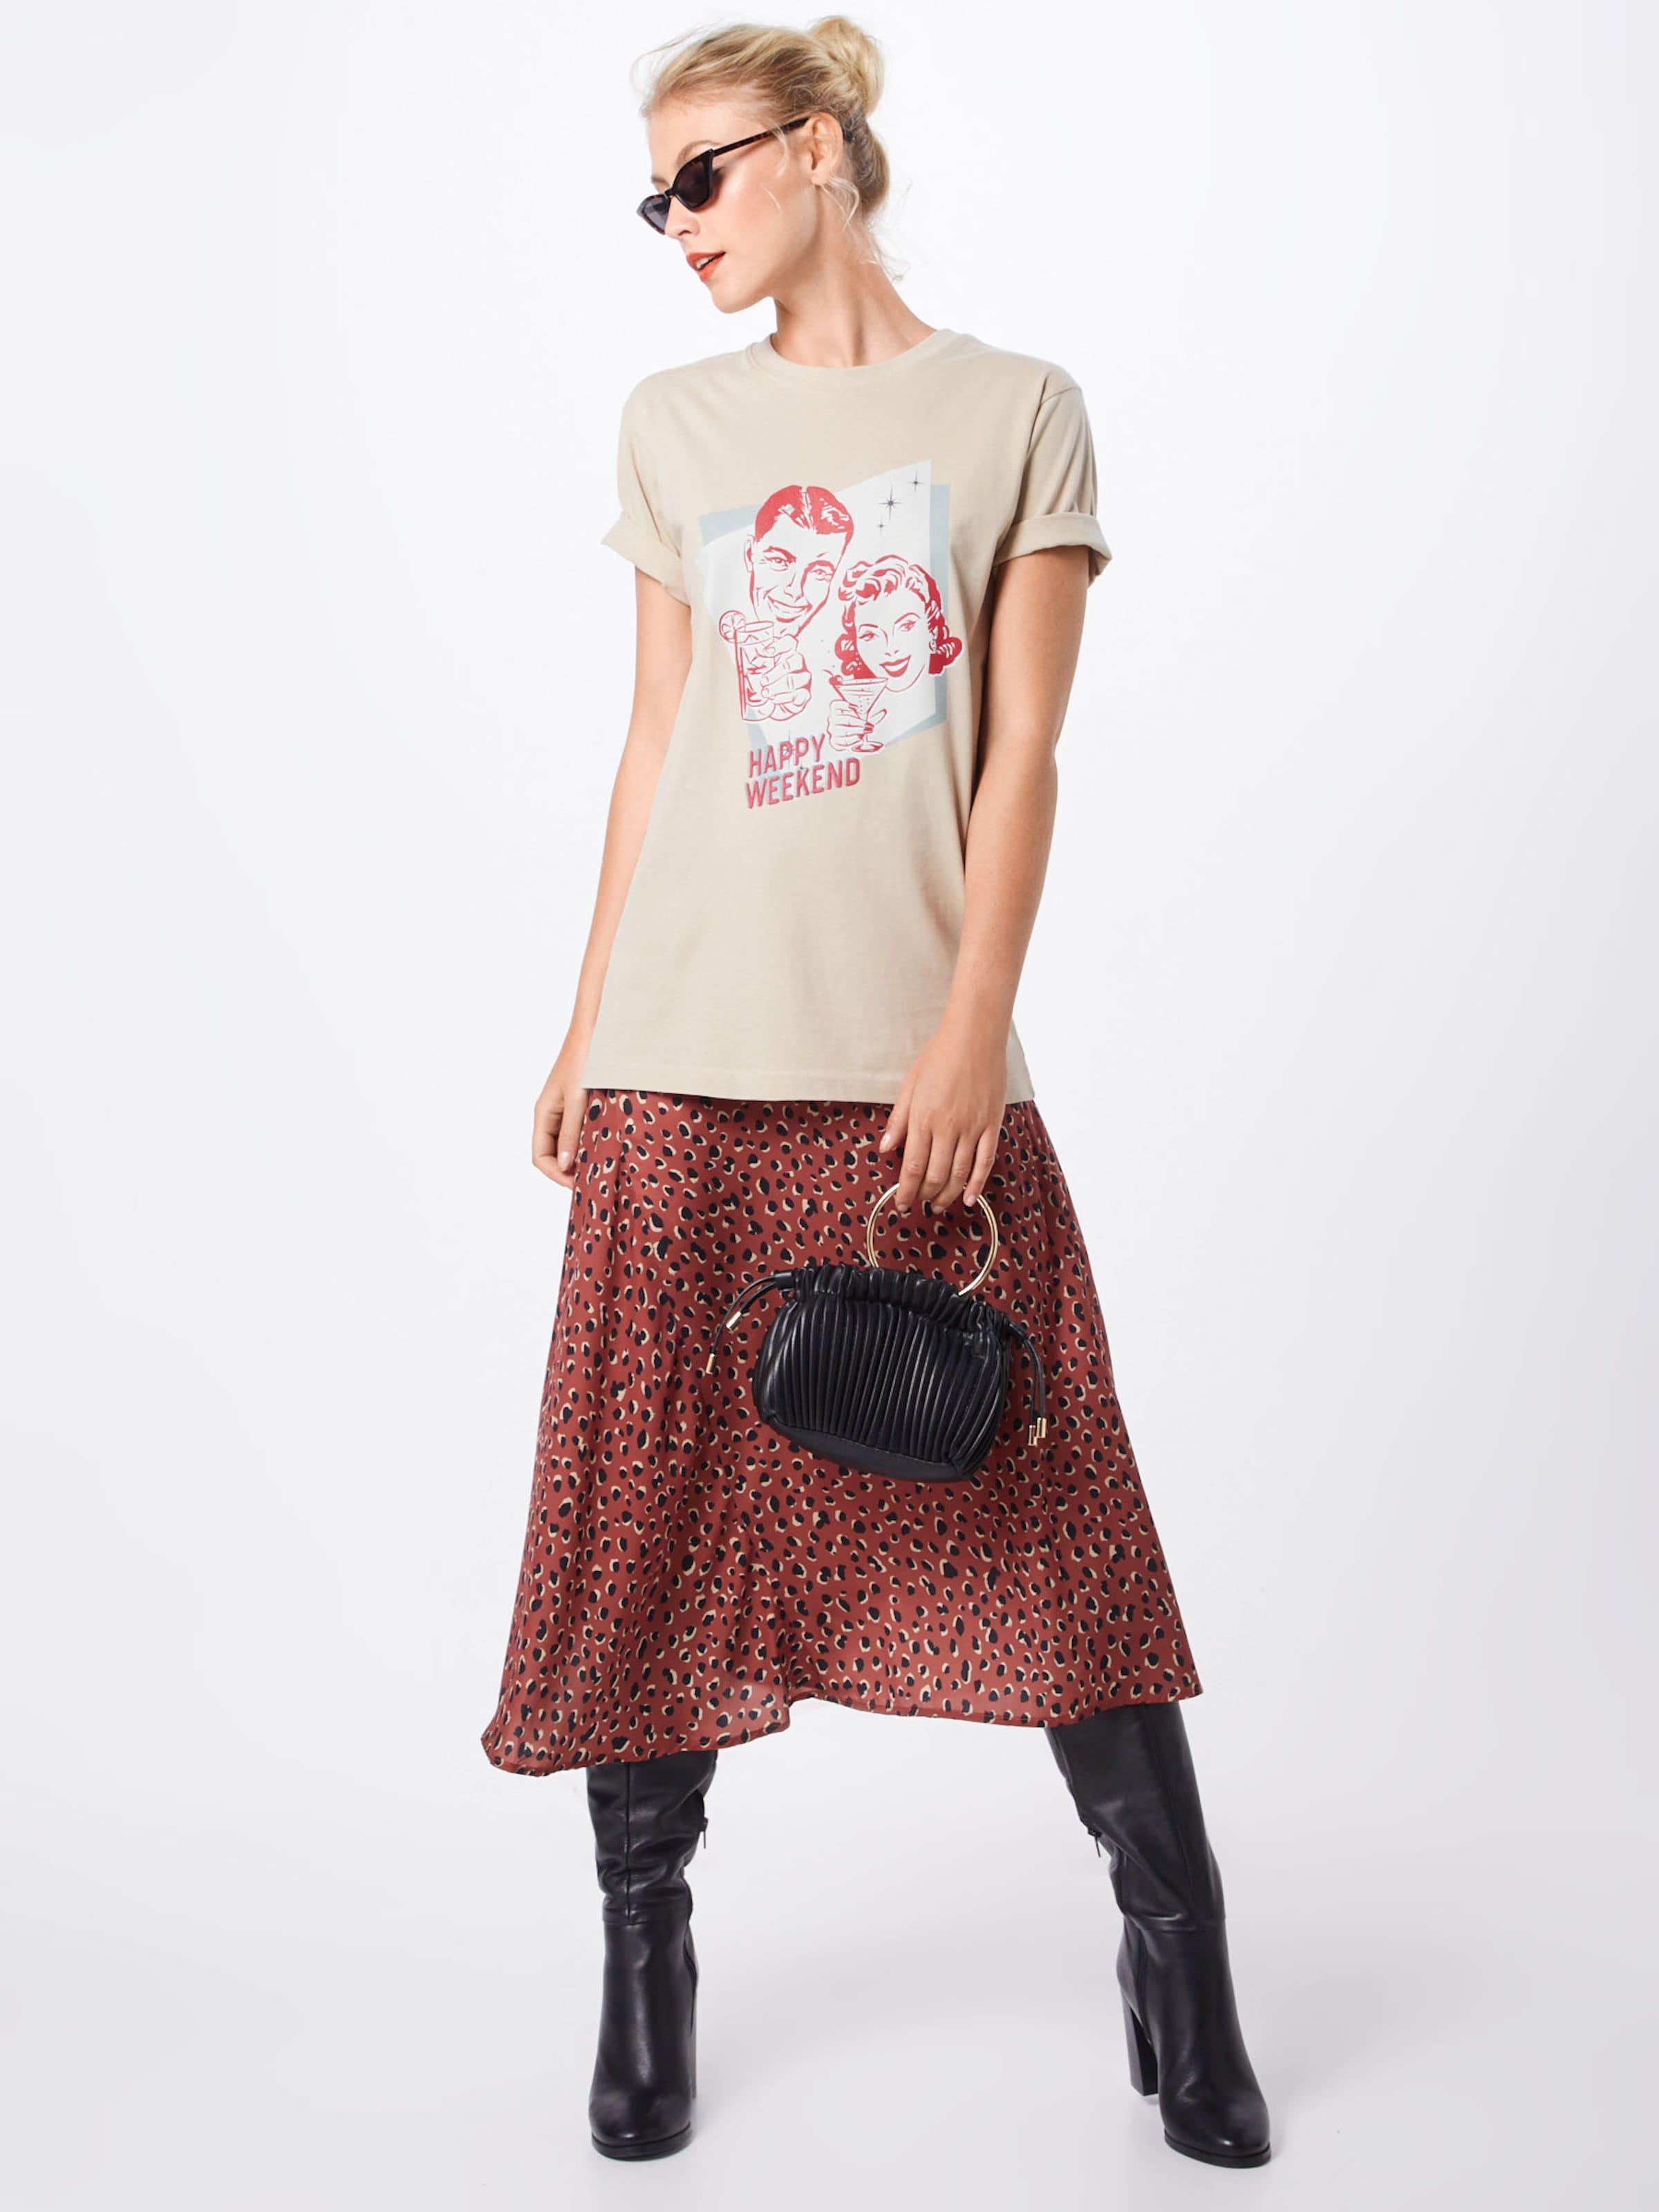 SandMischfarben Tee' Shirt Happy In Merchcode 'ladies Weekend OkwuXTliPZ